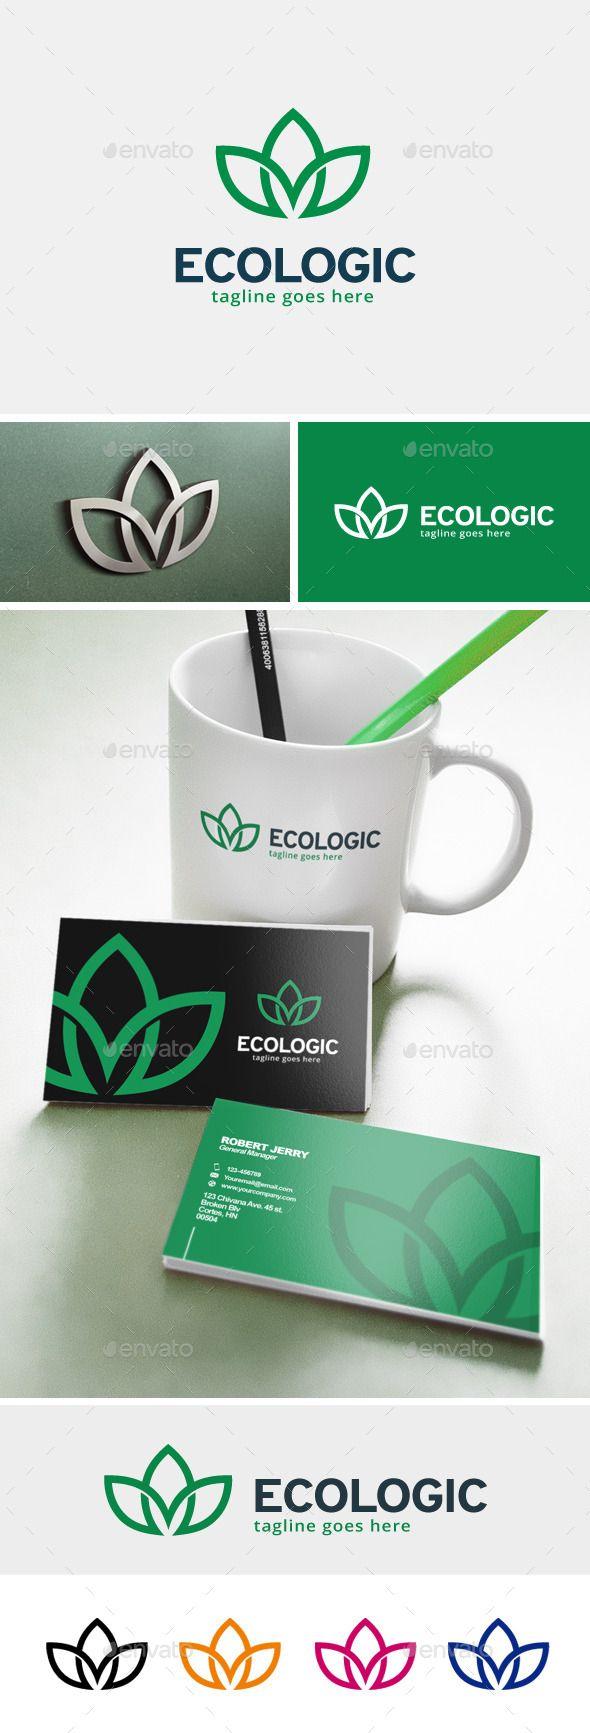 Ecologic - Logo Design Template Vector #logotype Download it here: http://graphicriver.net/item/ecologic-logo/12109755?s_rank=638?ref=nesto